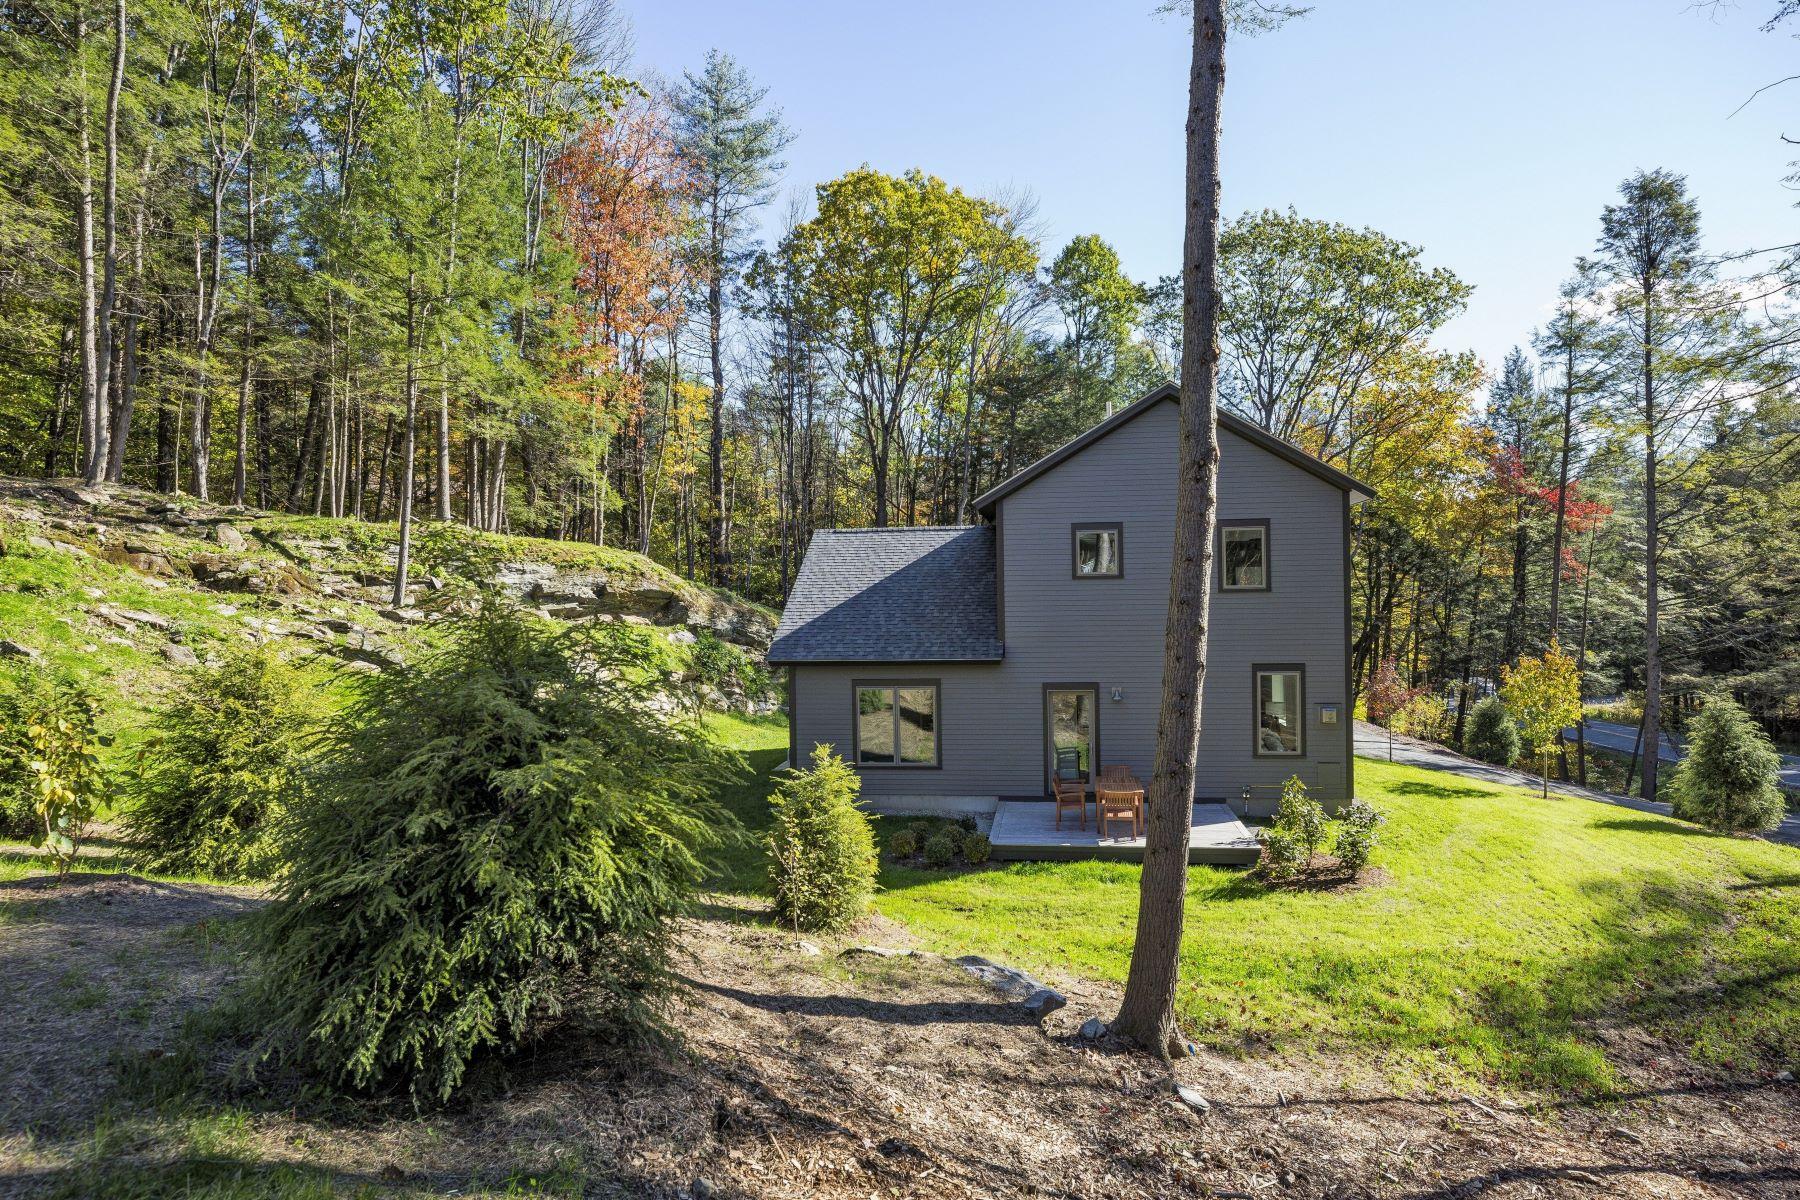 Single Family Home for Sale at 997 Willard Road 5204, Hartford 997 Willard Rd 5204 Hartford, Vermont 05059 United States